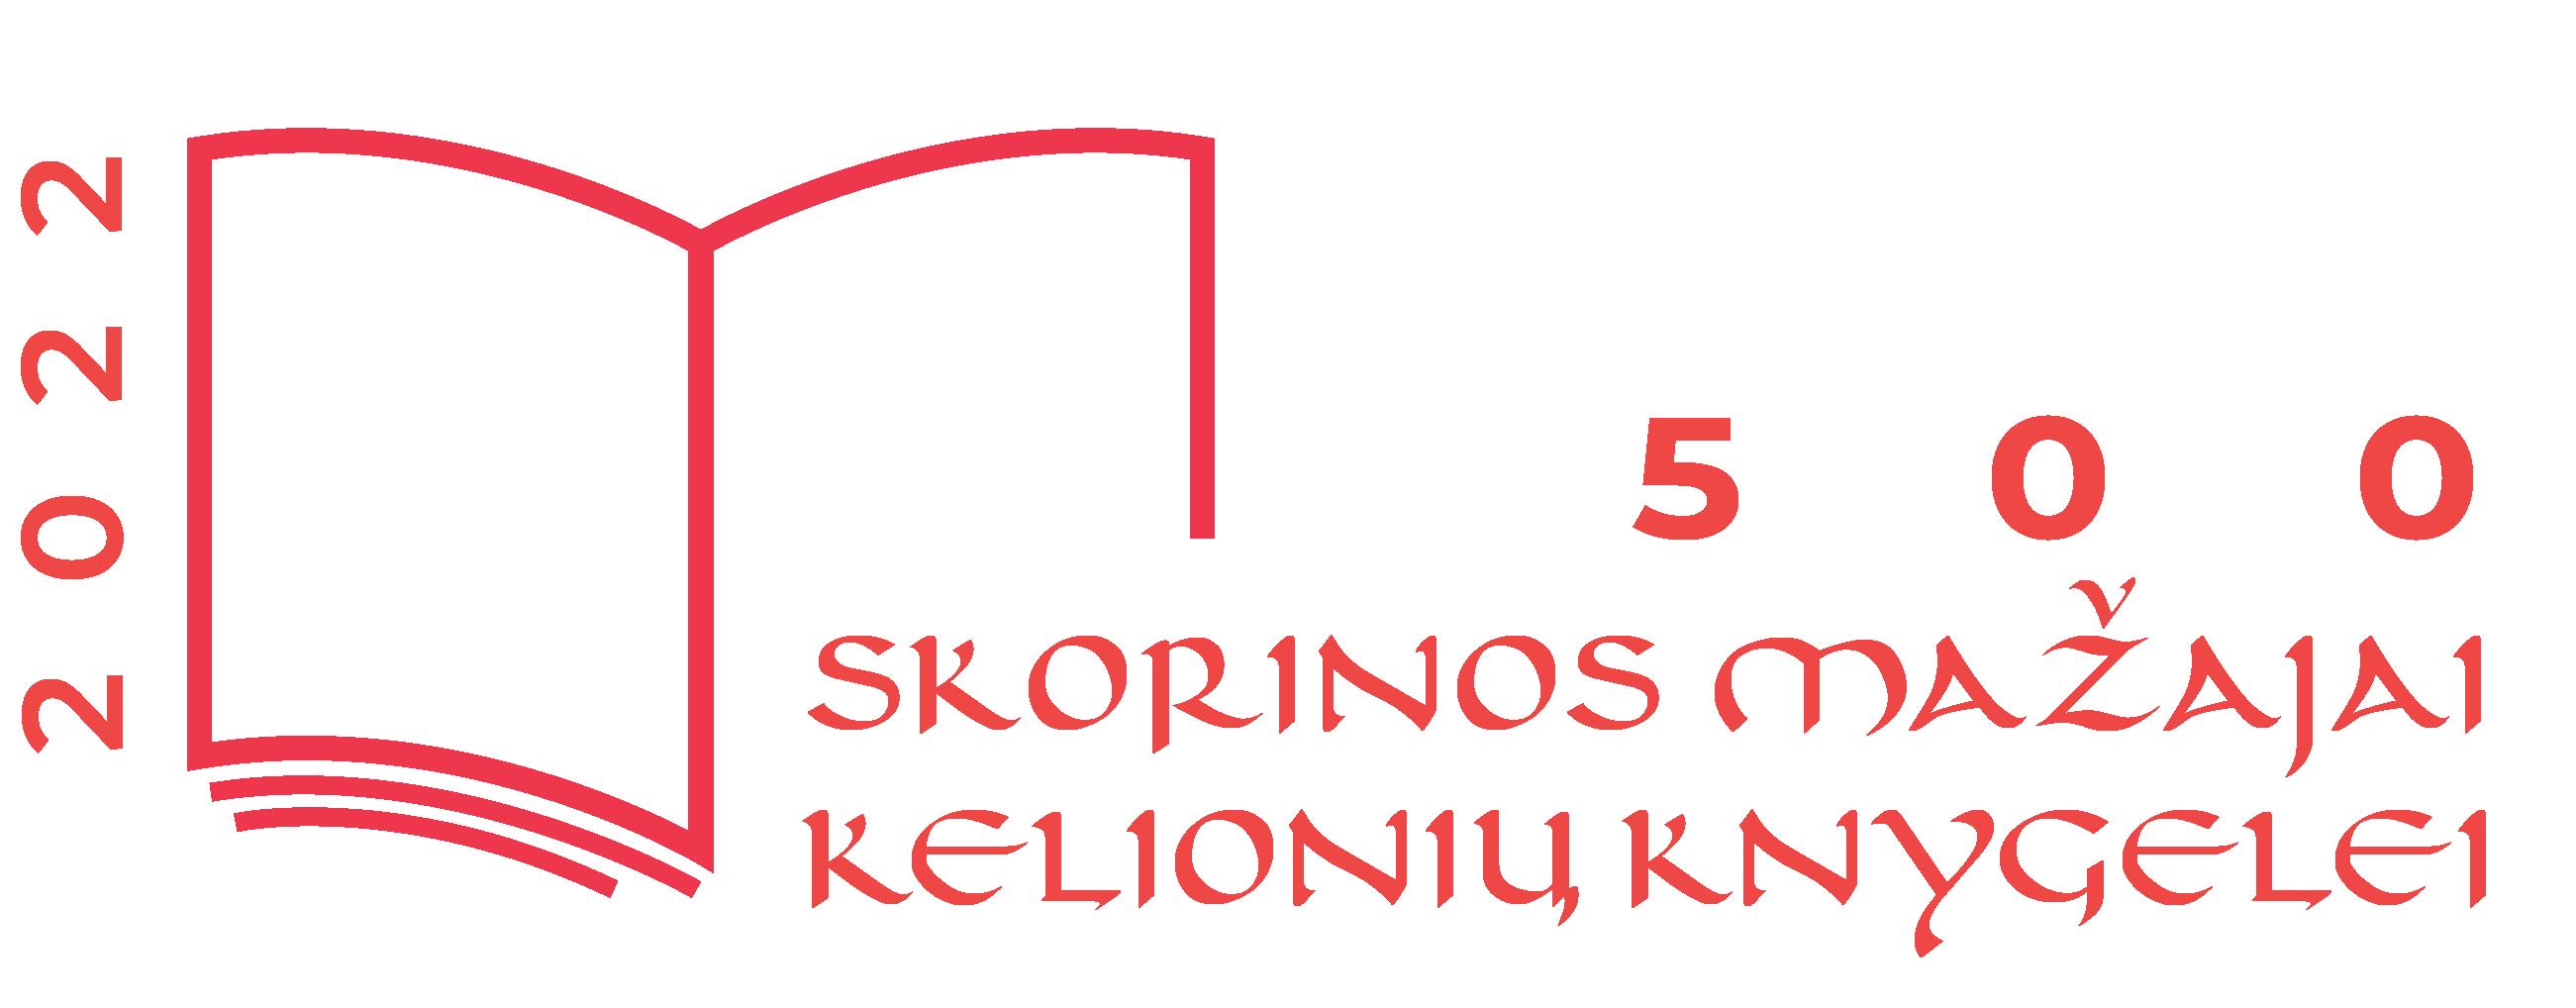 Francysk Skaryna and the Renaissance book culture